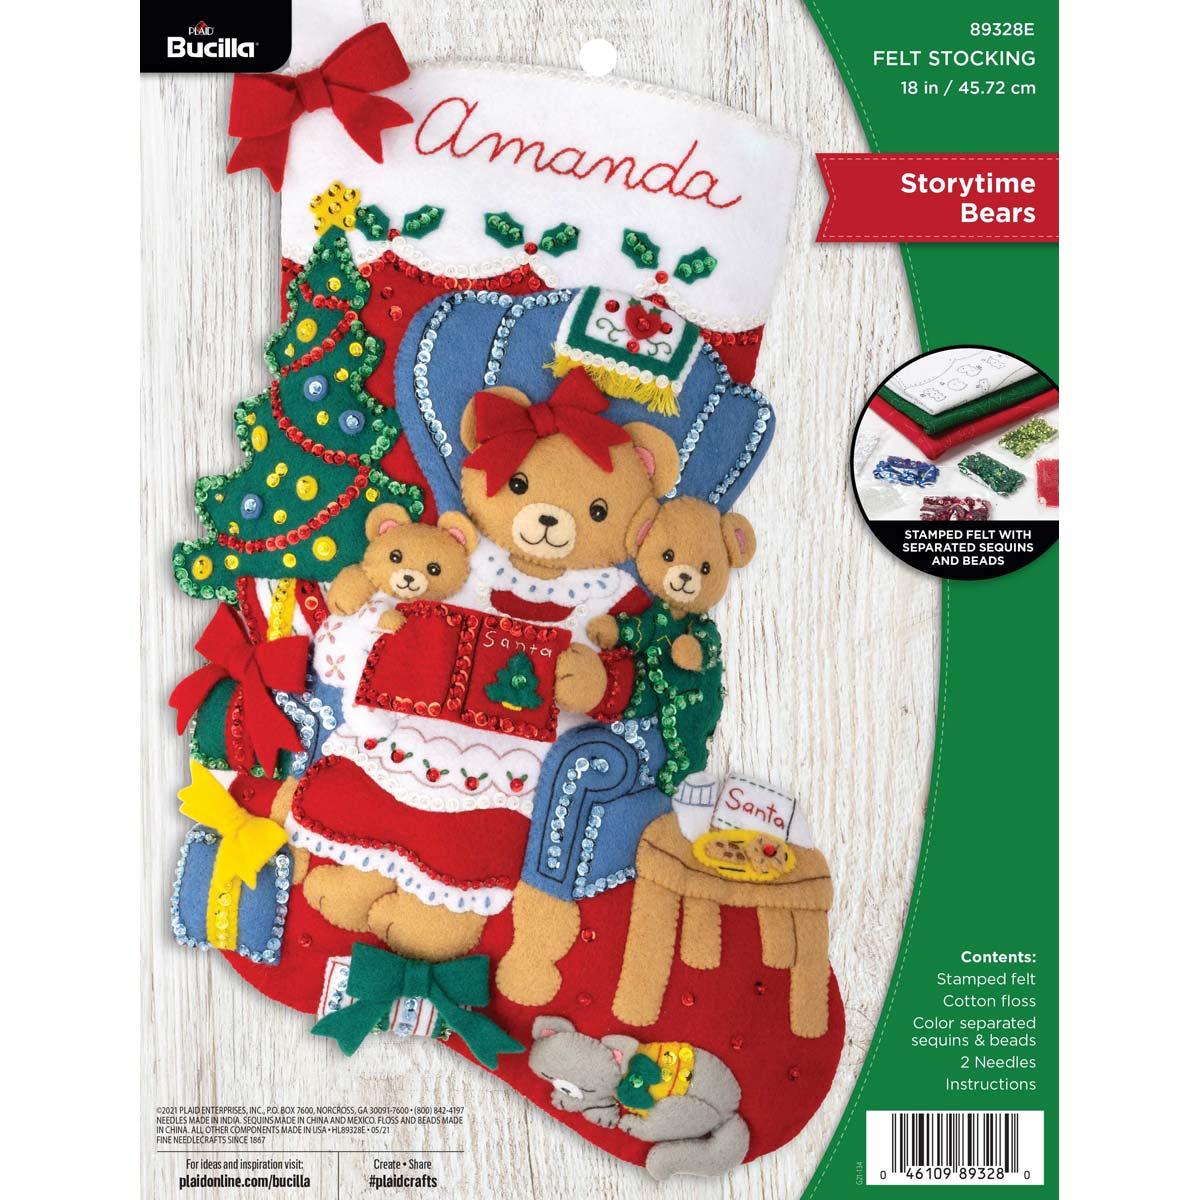 Bucilla ® Seasonal - Felt - Stocking Kits - Storytime Bears - 89328E